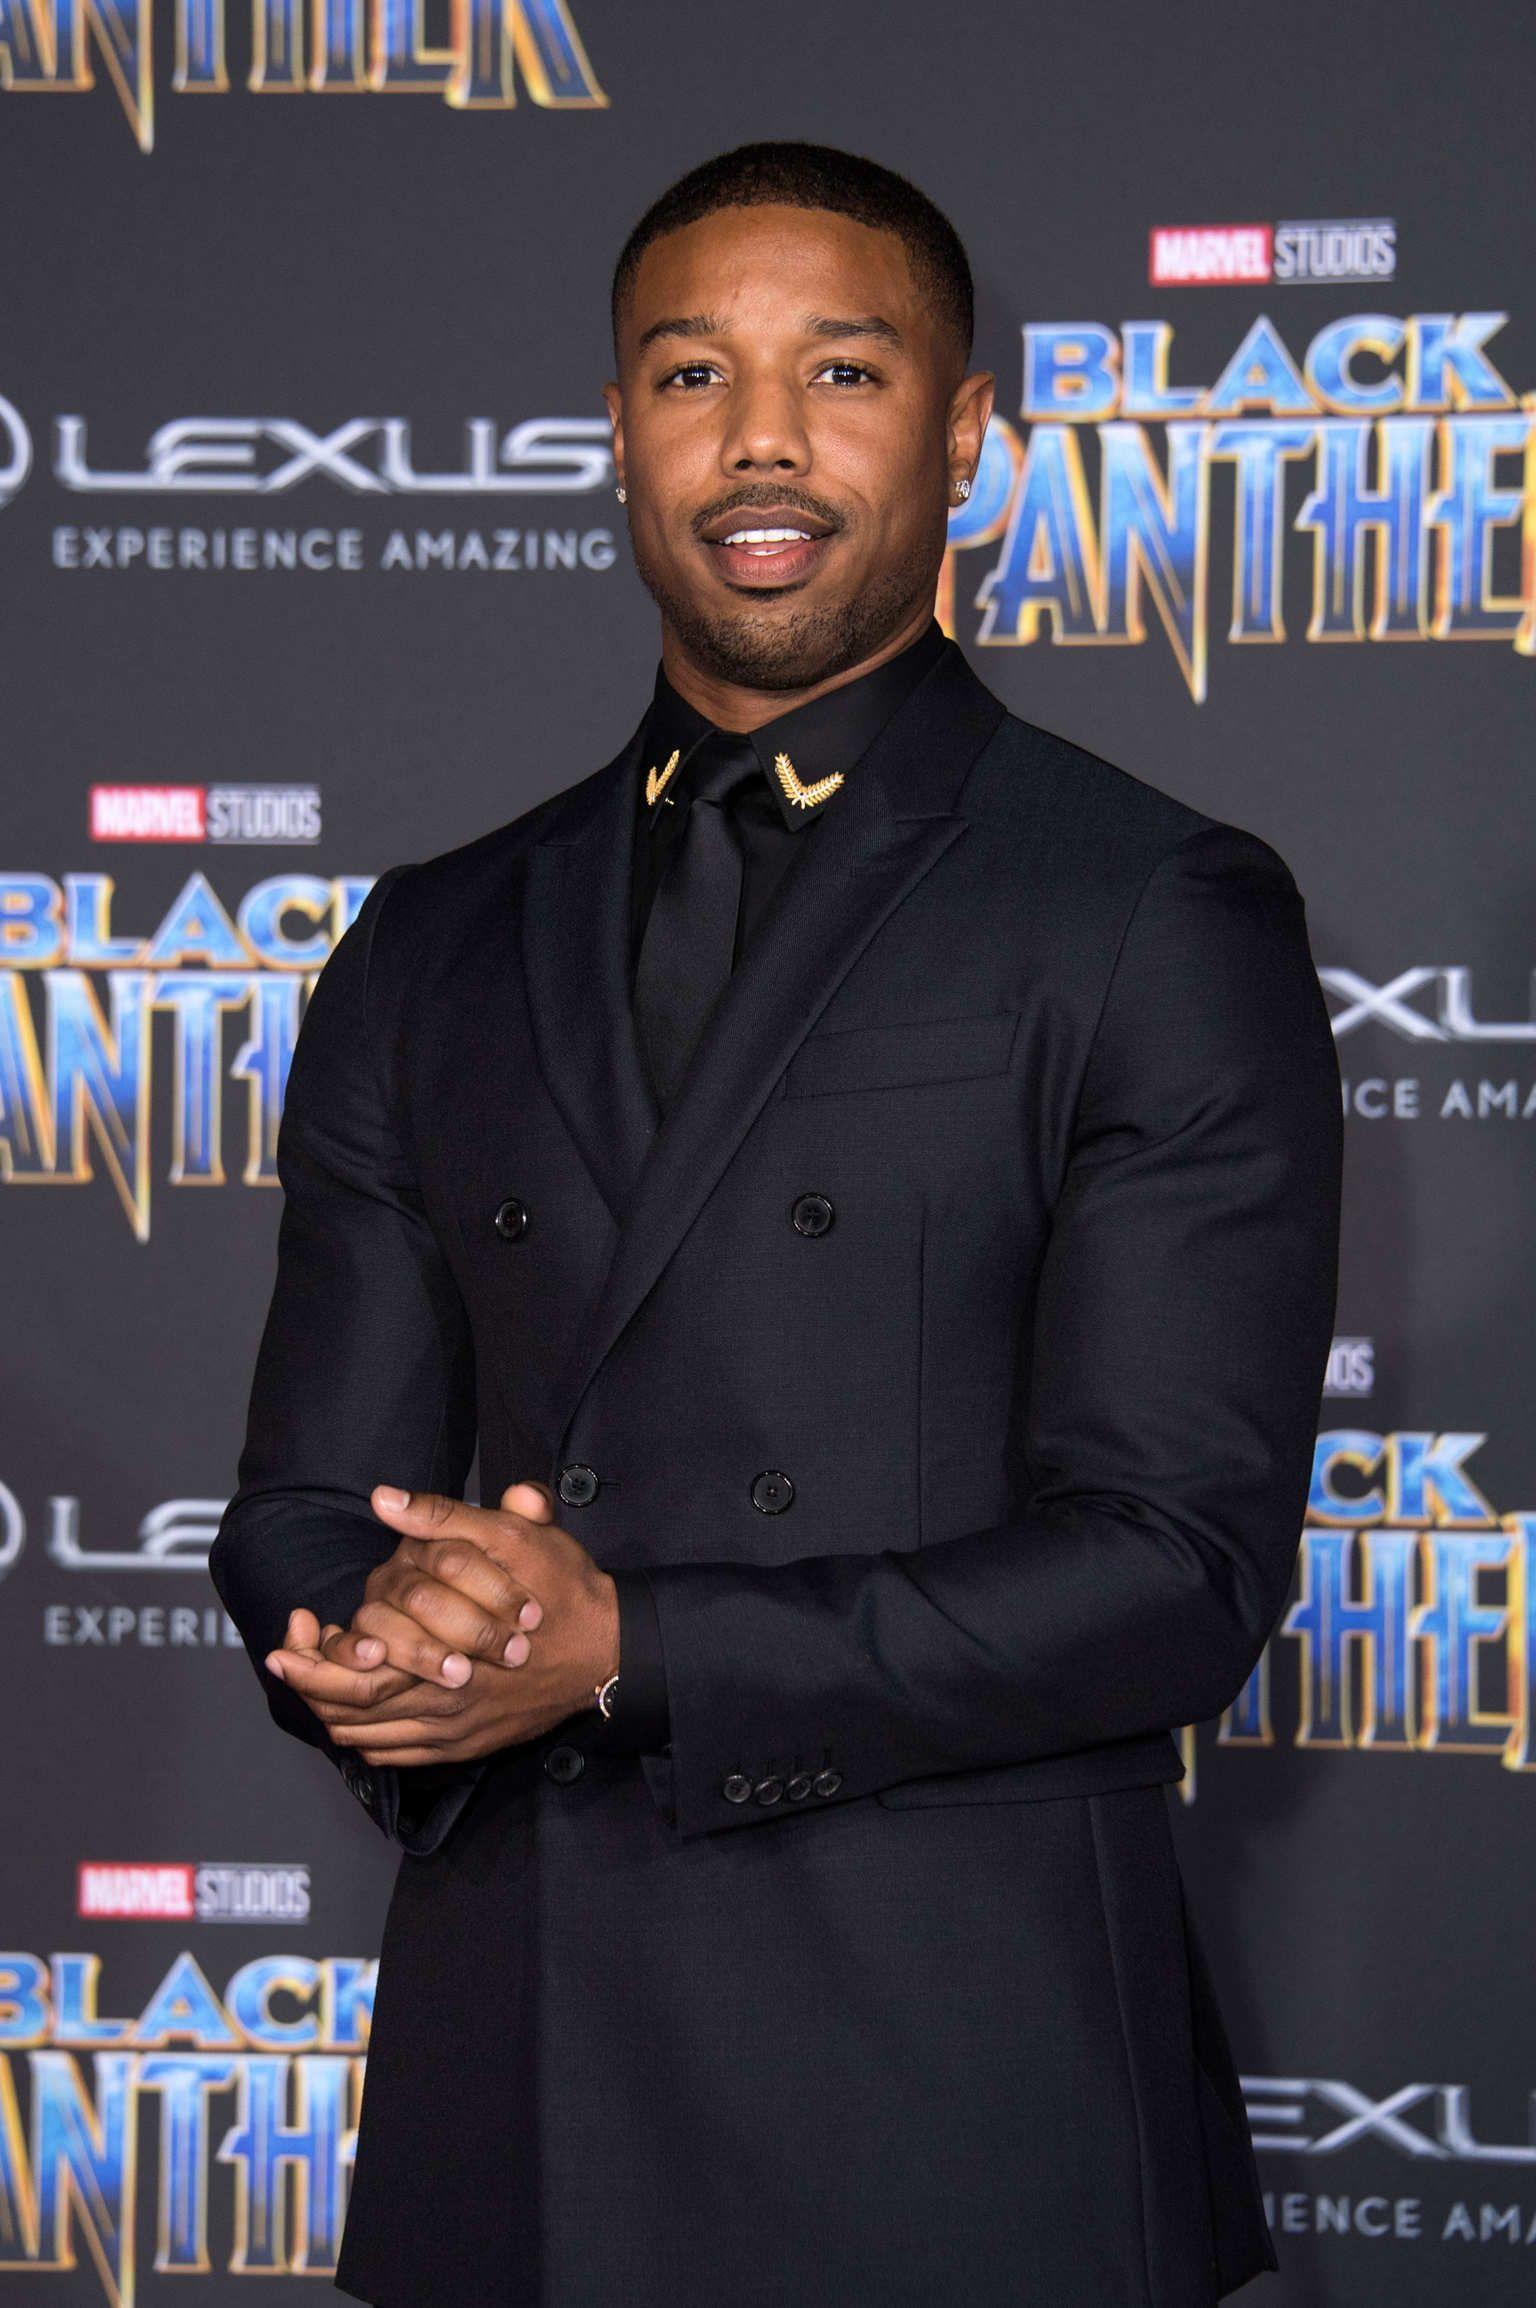 6a3c1cd0fc8 Michael B. Jordan at Black Panther premiere #MichaelBJordan #BlackPanther